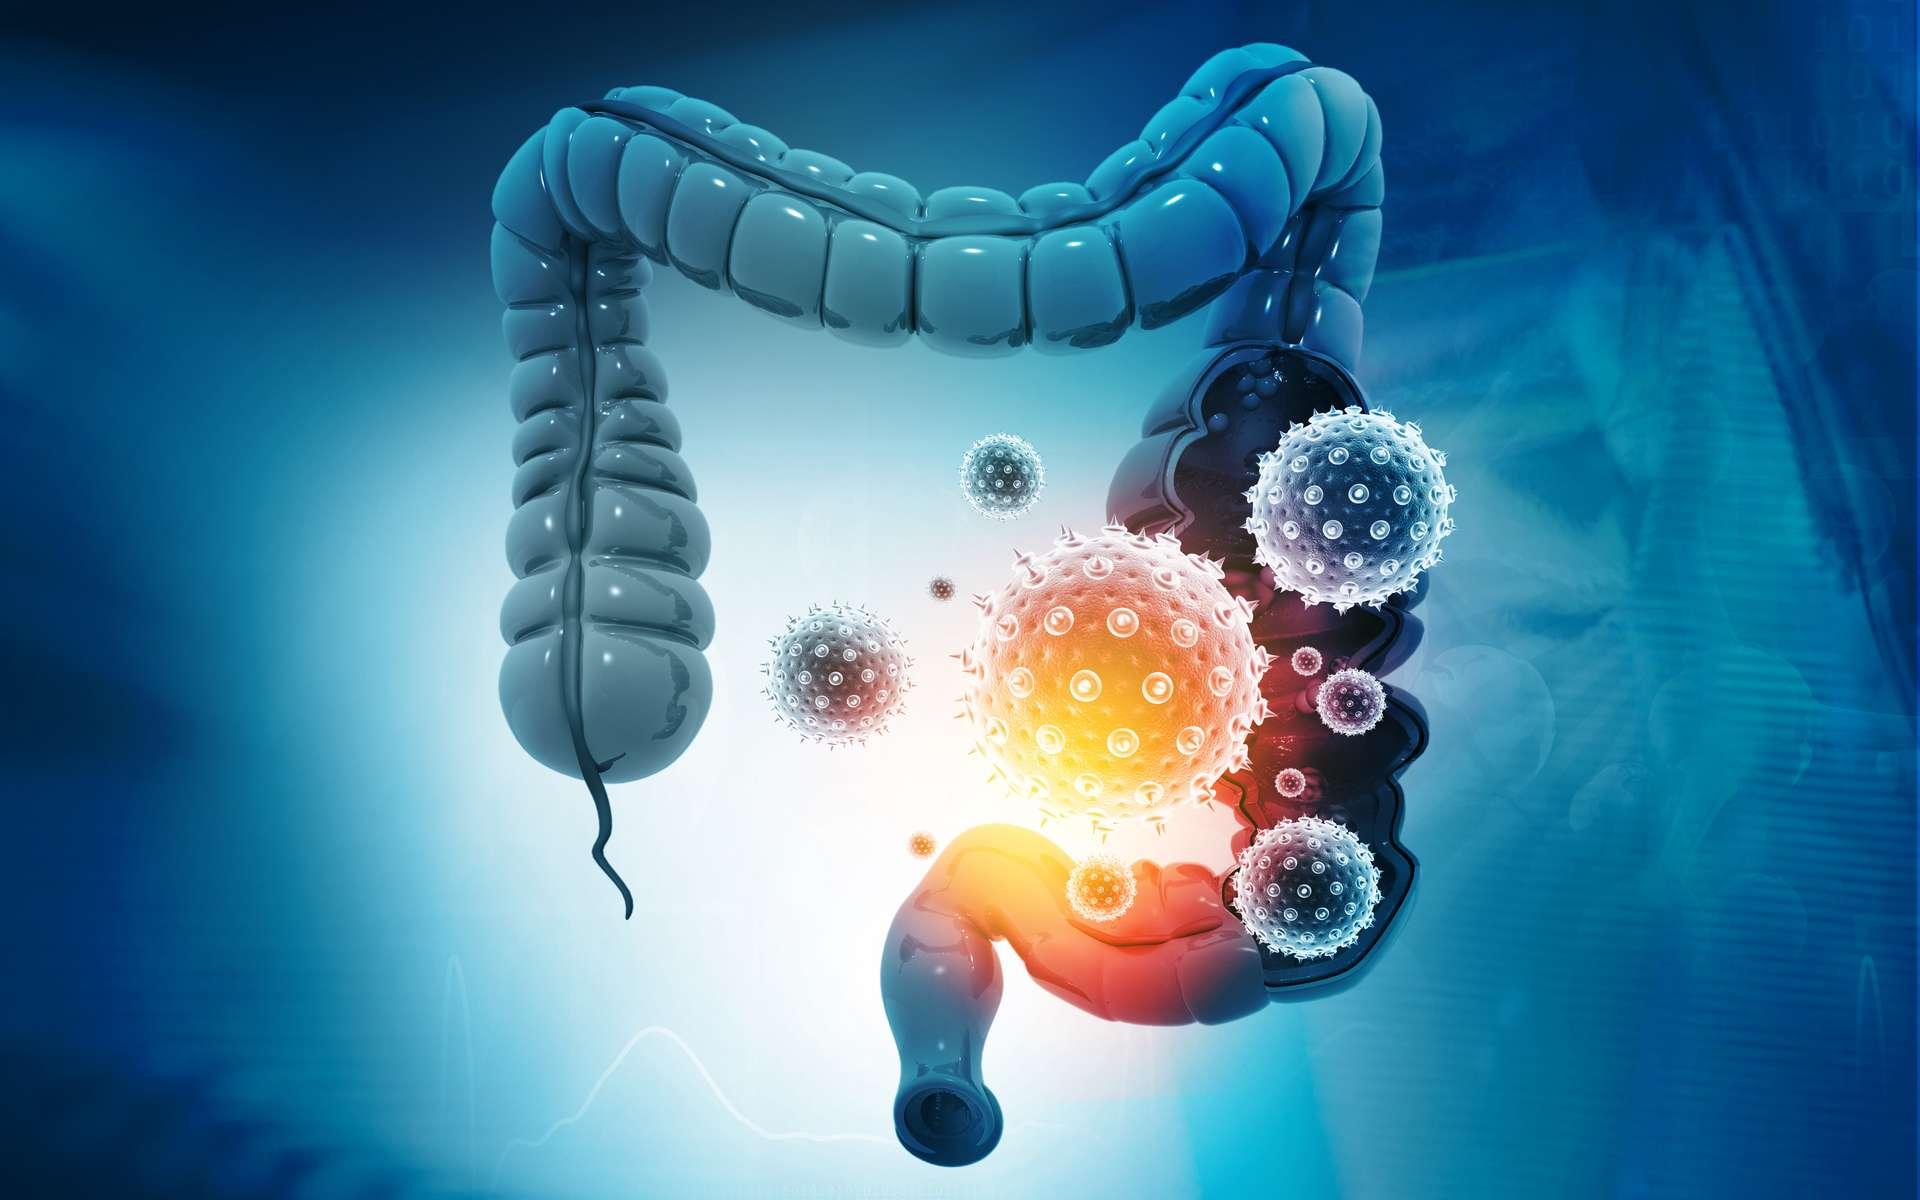 Le SARS-CoV-2 s'attaque aussi aux intestins. © Rasi, Adobe Stock